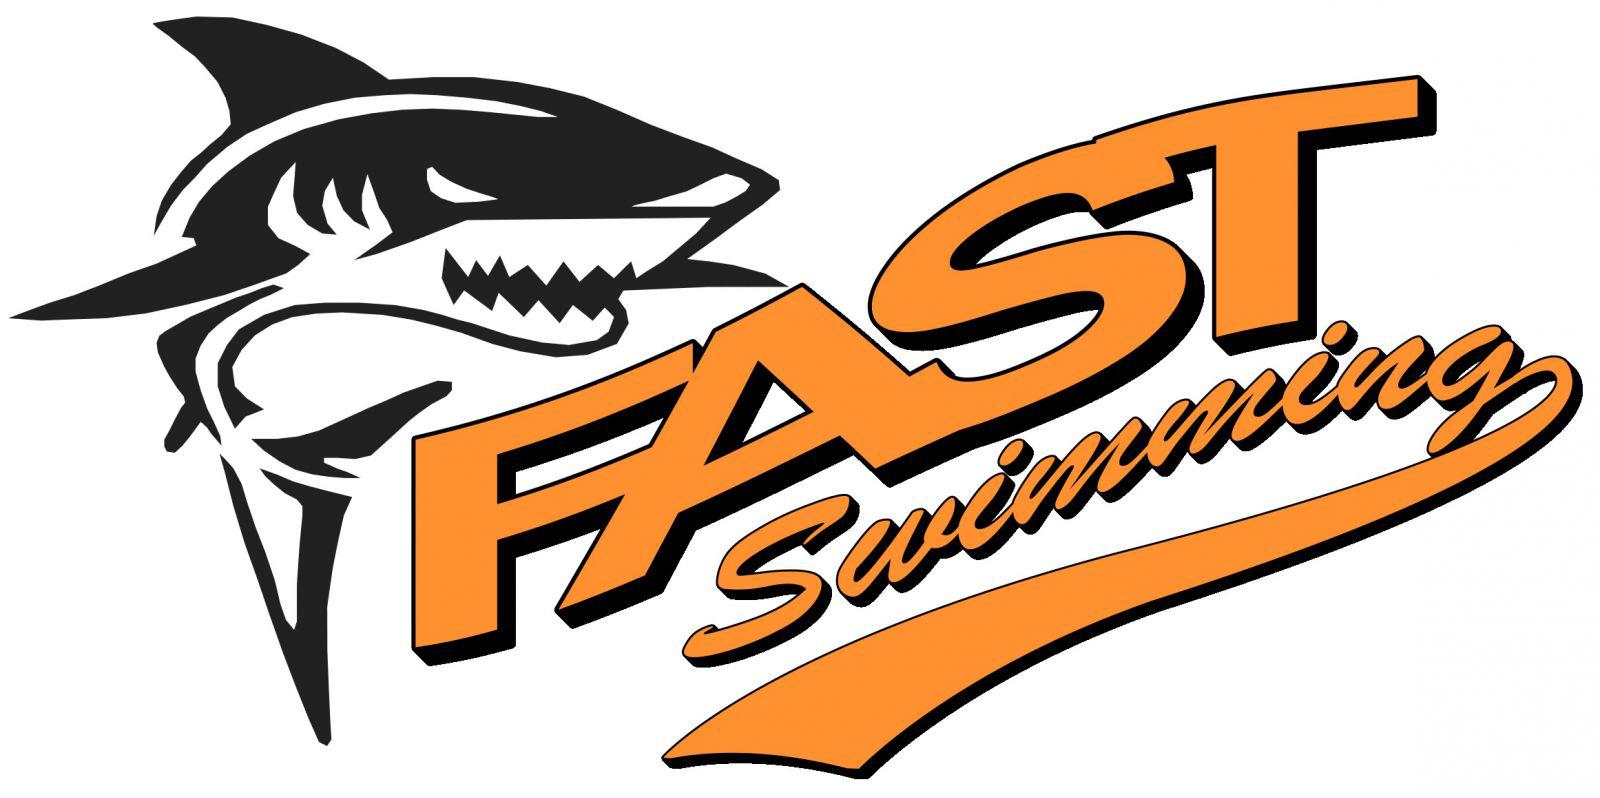 Tiger Shark clipart orange #5